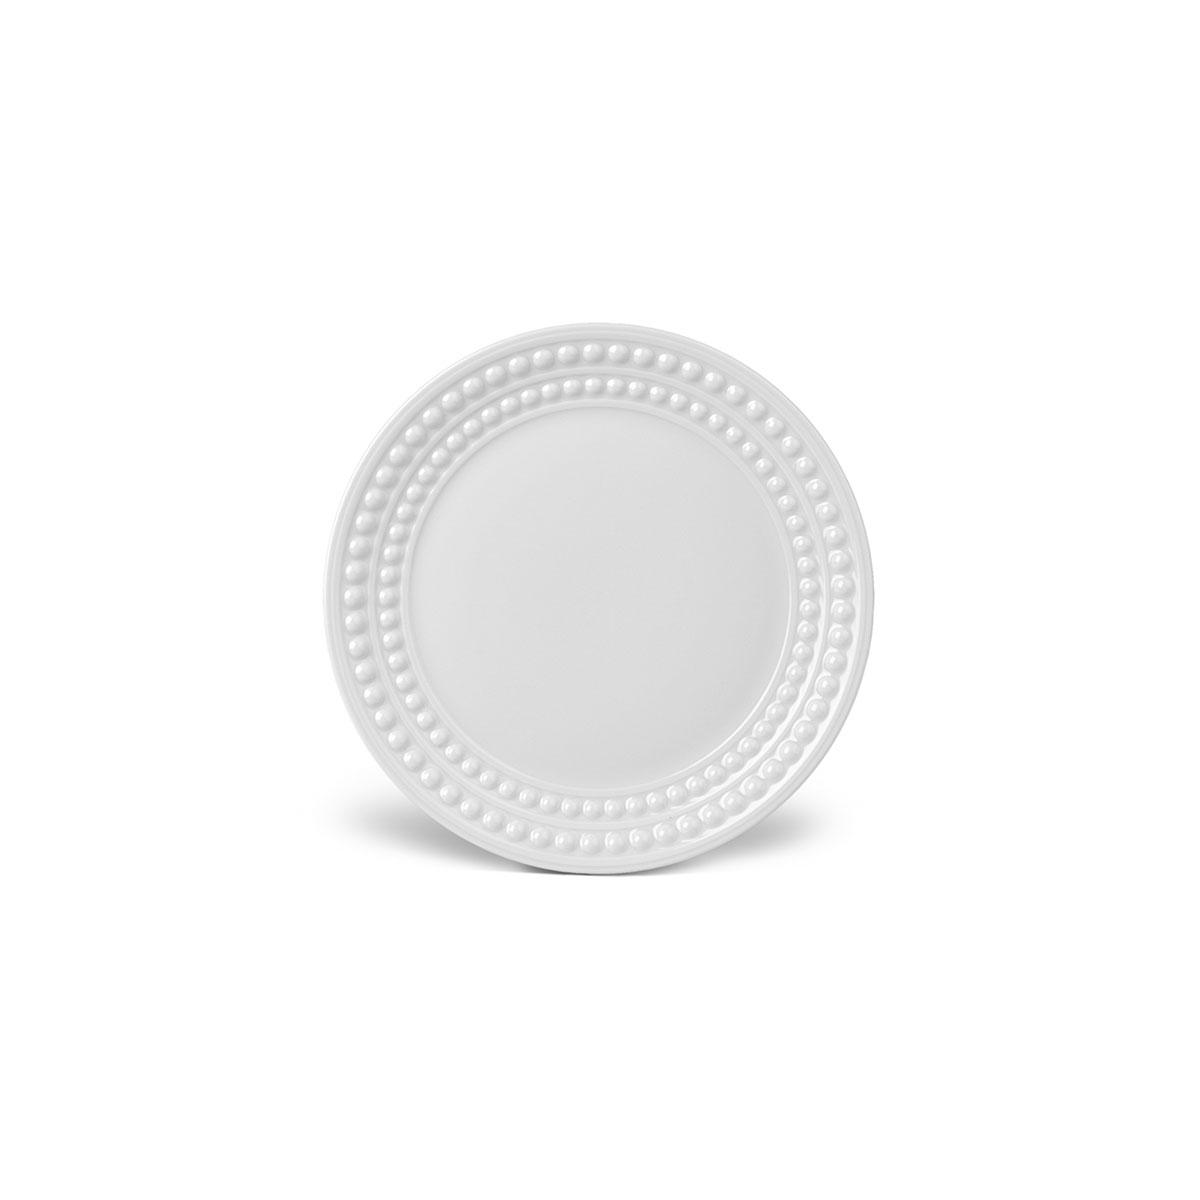 L'Objet I Perlée Bread + Butter Plate White